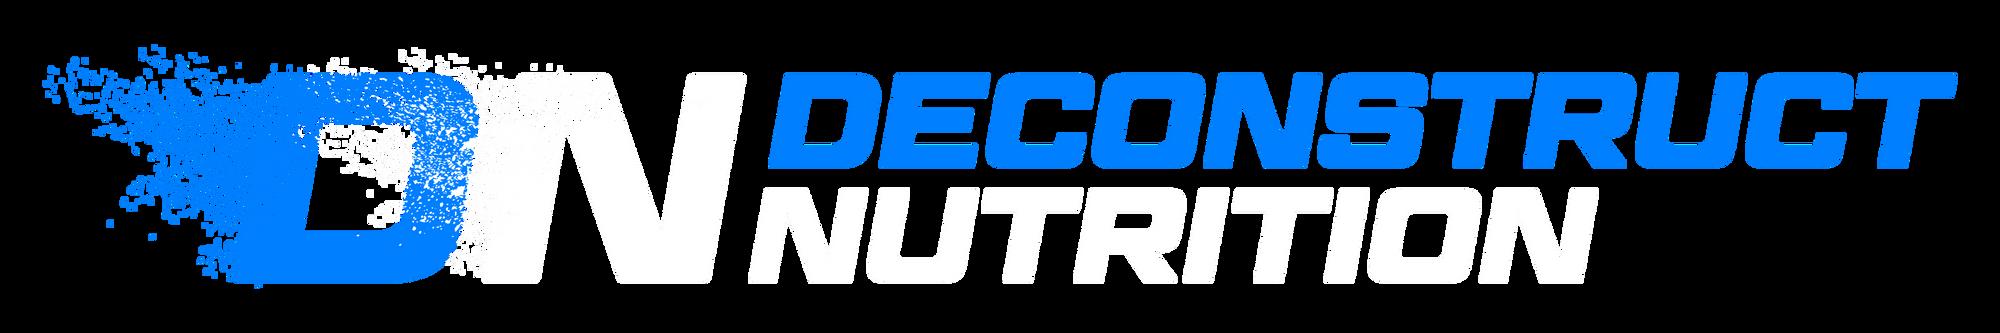 Deconstruct Nutrition